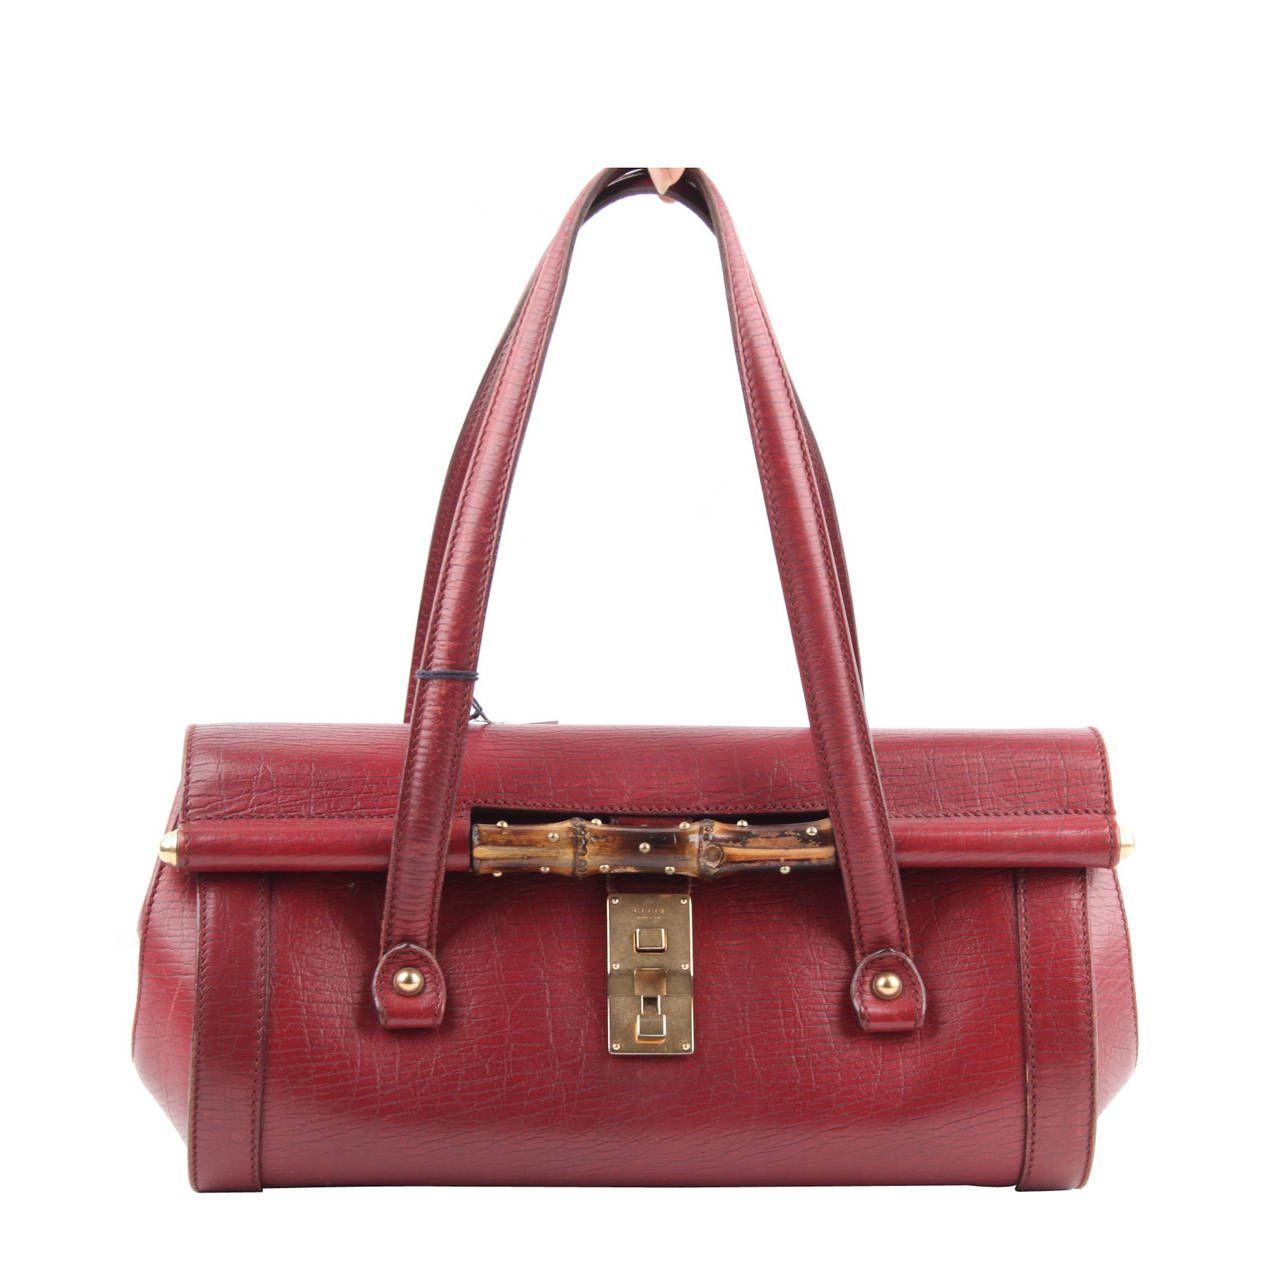 a6bf323bce36ea GUCCI Burgundy Leather BULLET BAG Handbag TOM FORD ERA Satchel w/ BAMBOO    From a